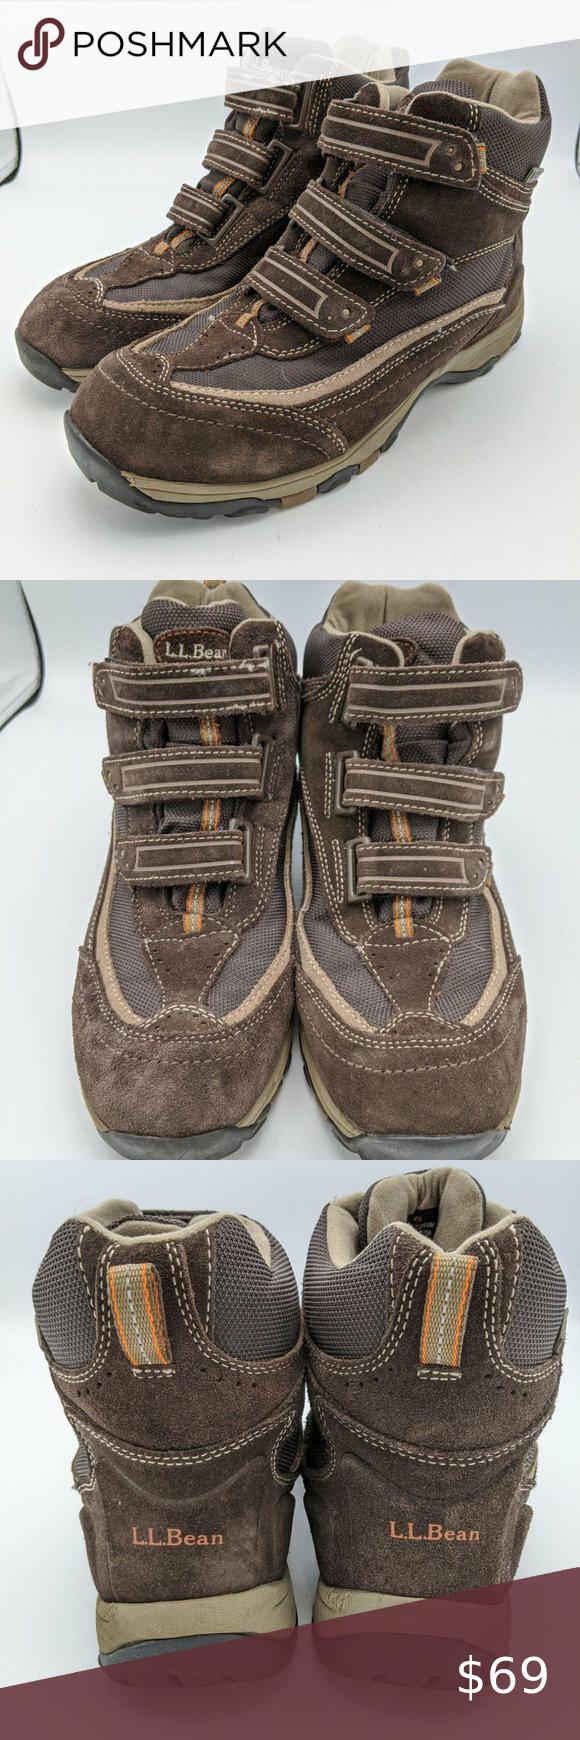 LL Bean Boots TEK 2.5 Straps Brown